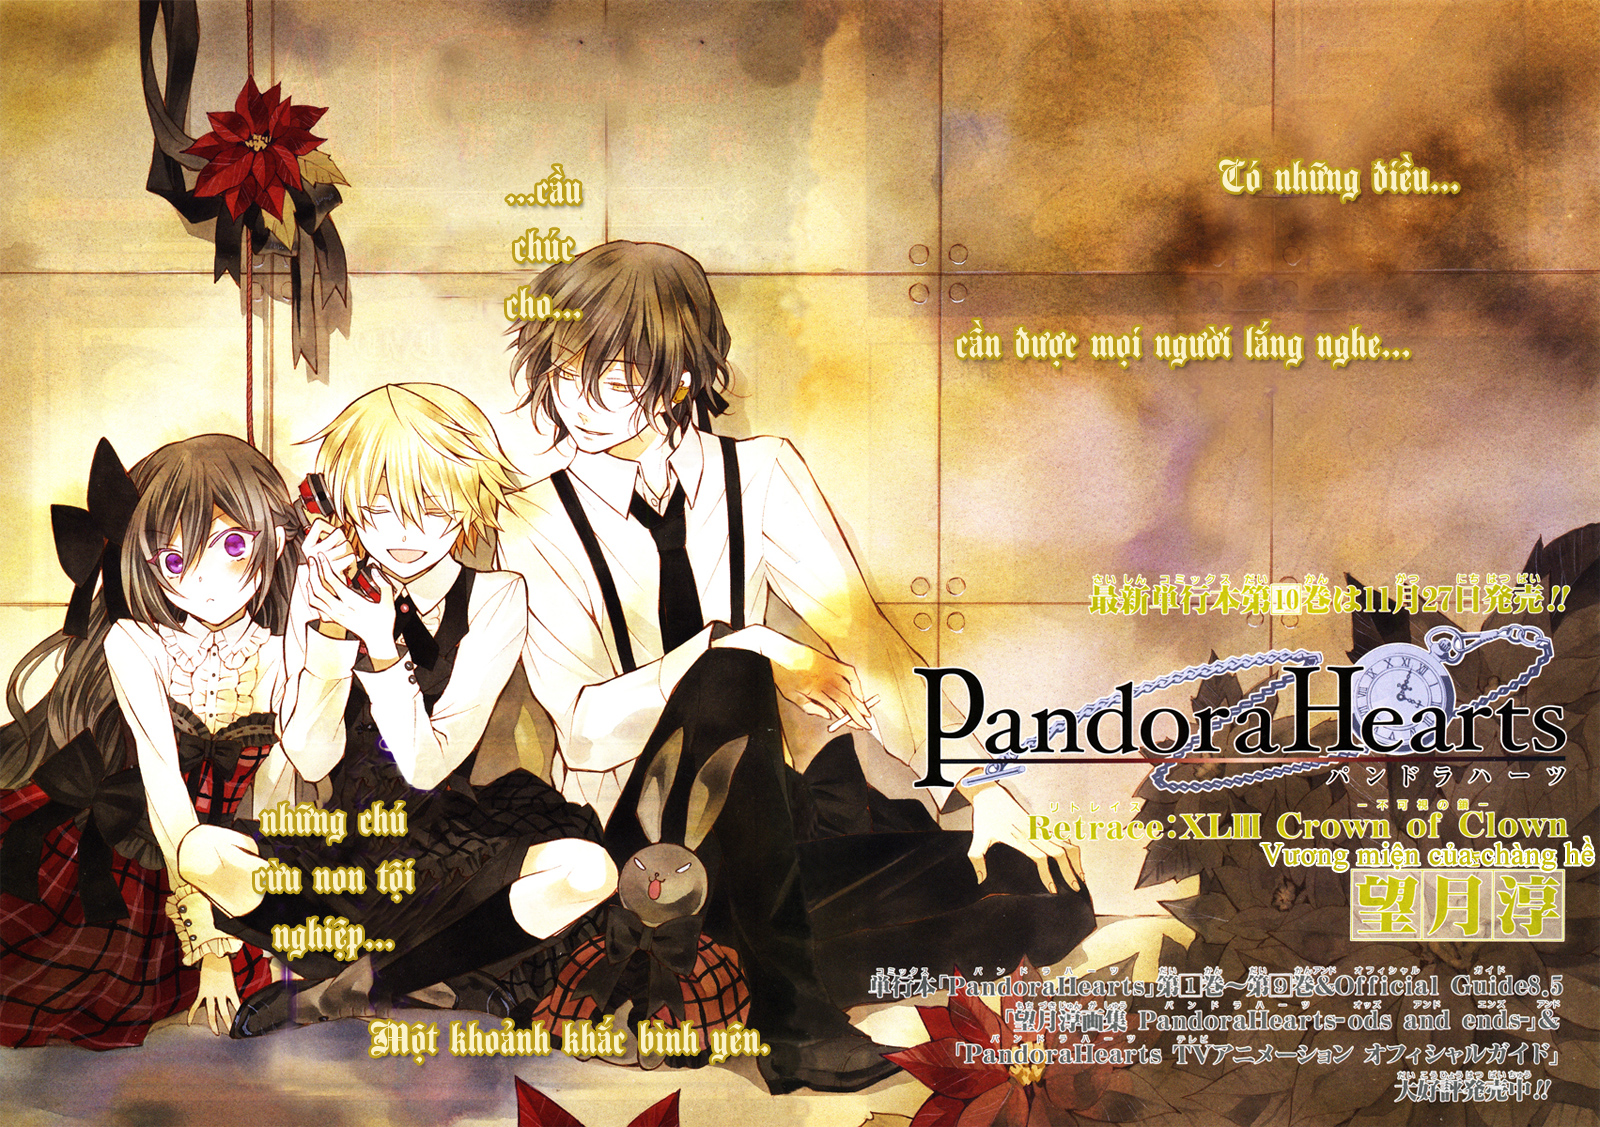 Pandora Hearts chương 043 - retrace: xliii crown of clown trang 3